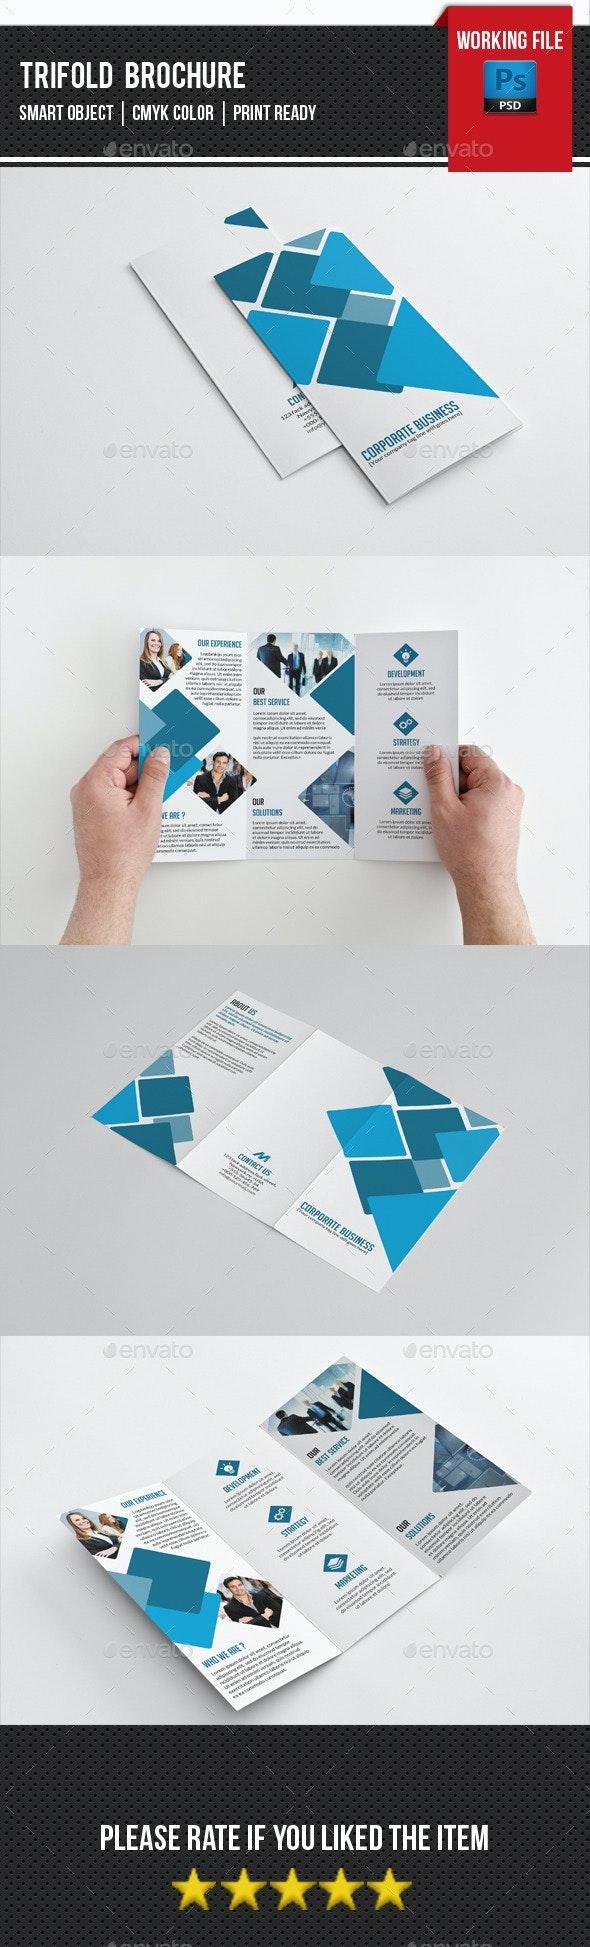 Creative Trifold Brochure-V238 - Corporate Brochures